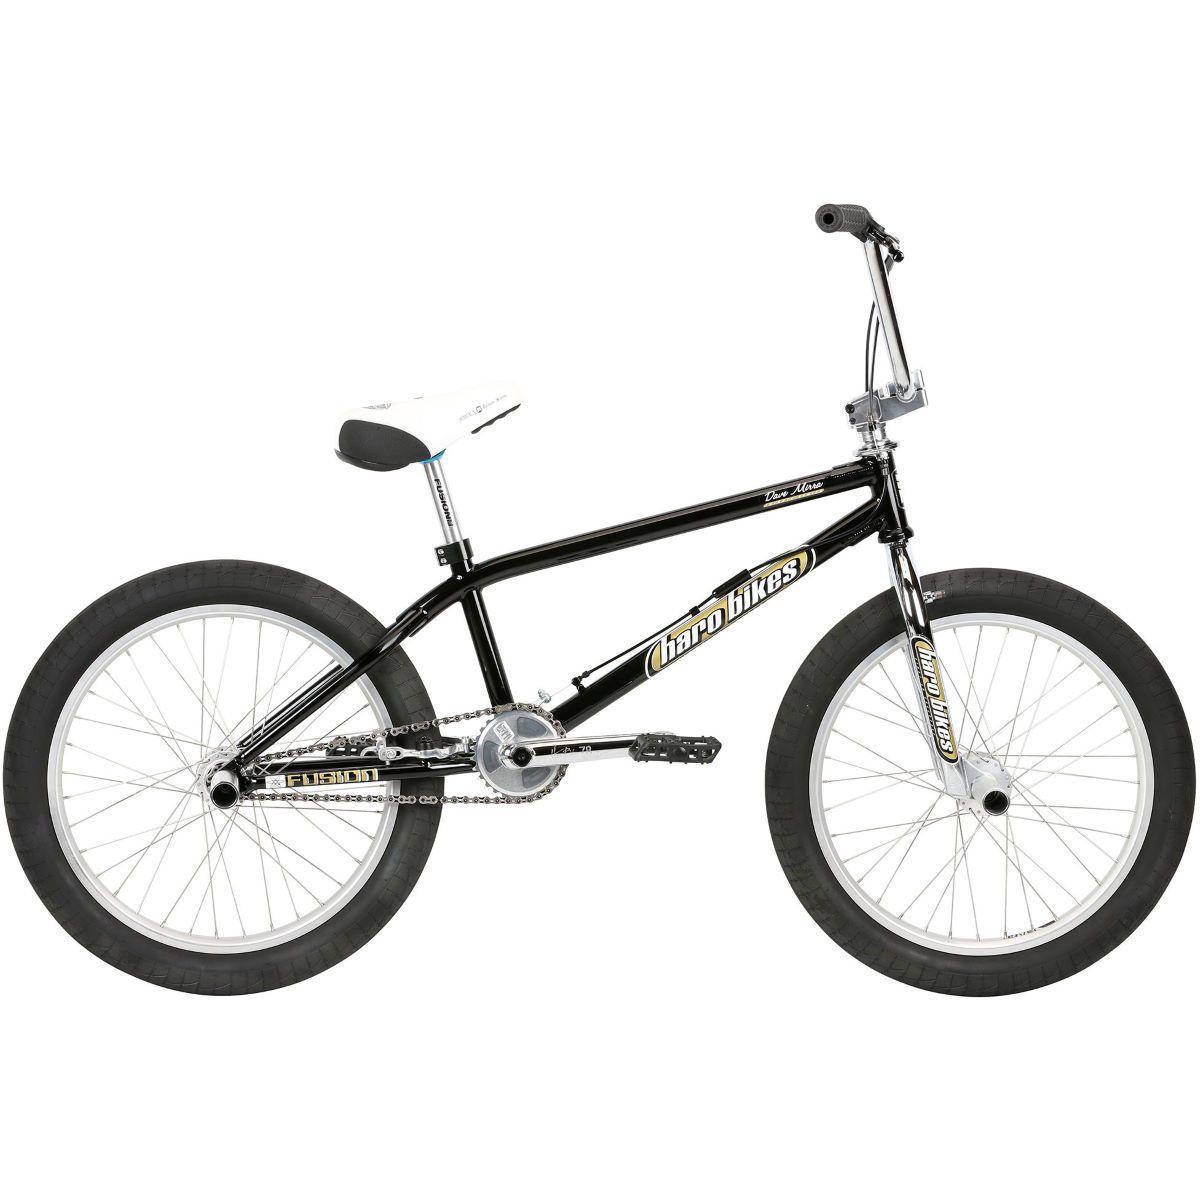 Haro Mirra Tribute Bmx Bike Freestyle Bmx Bikes 23369804415 Bike Freestyle Bmx Bikes Bmx Freestyle